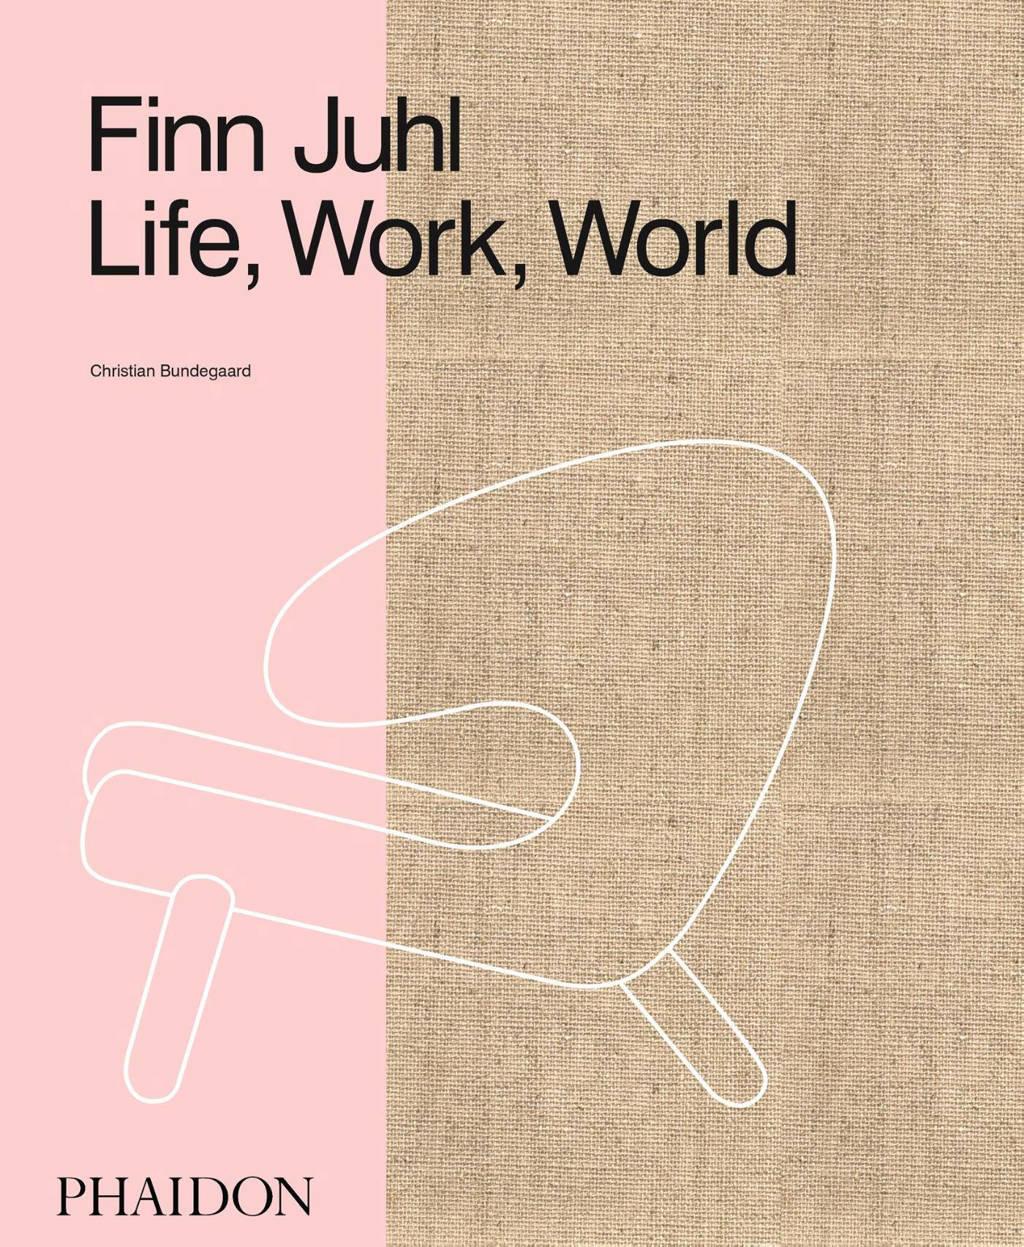 Finn Juhl - Christian Bundegaard